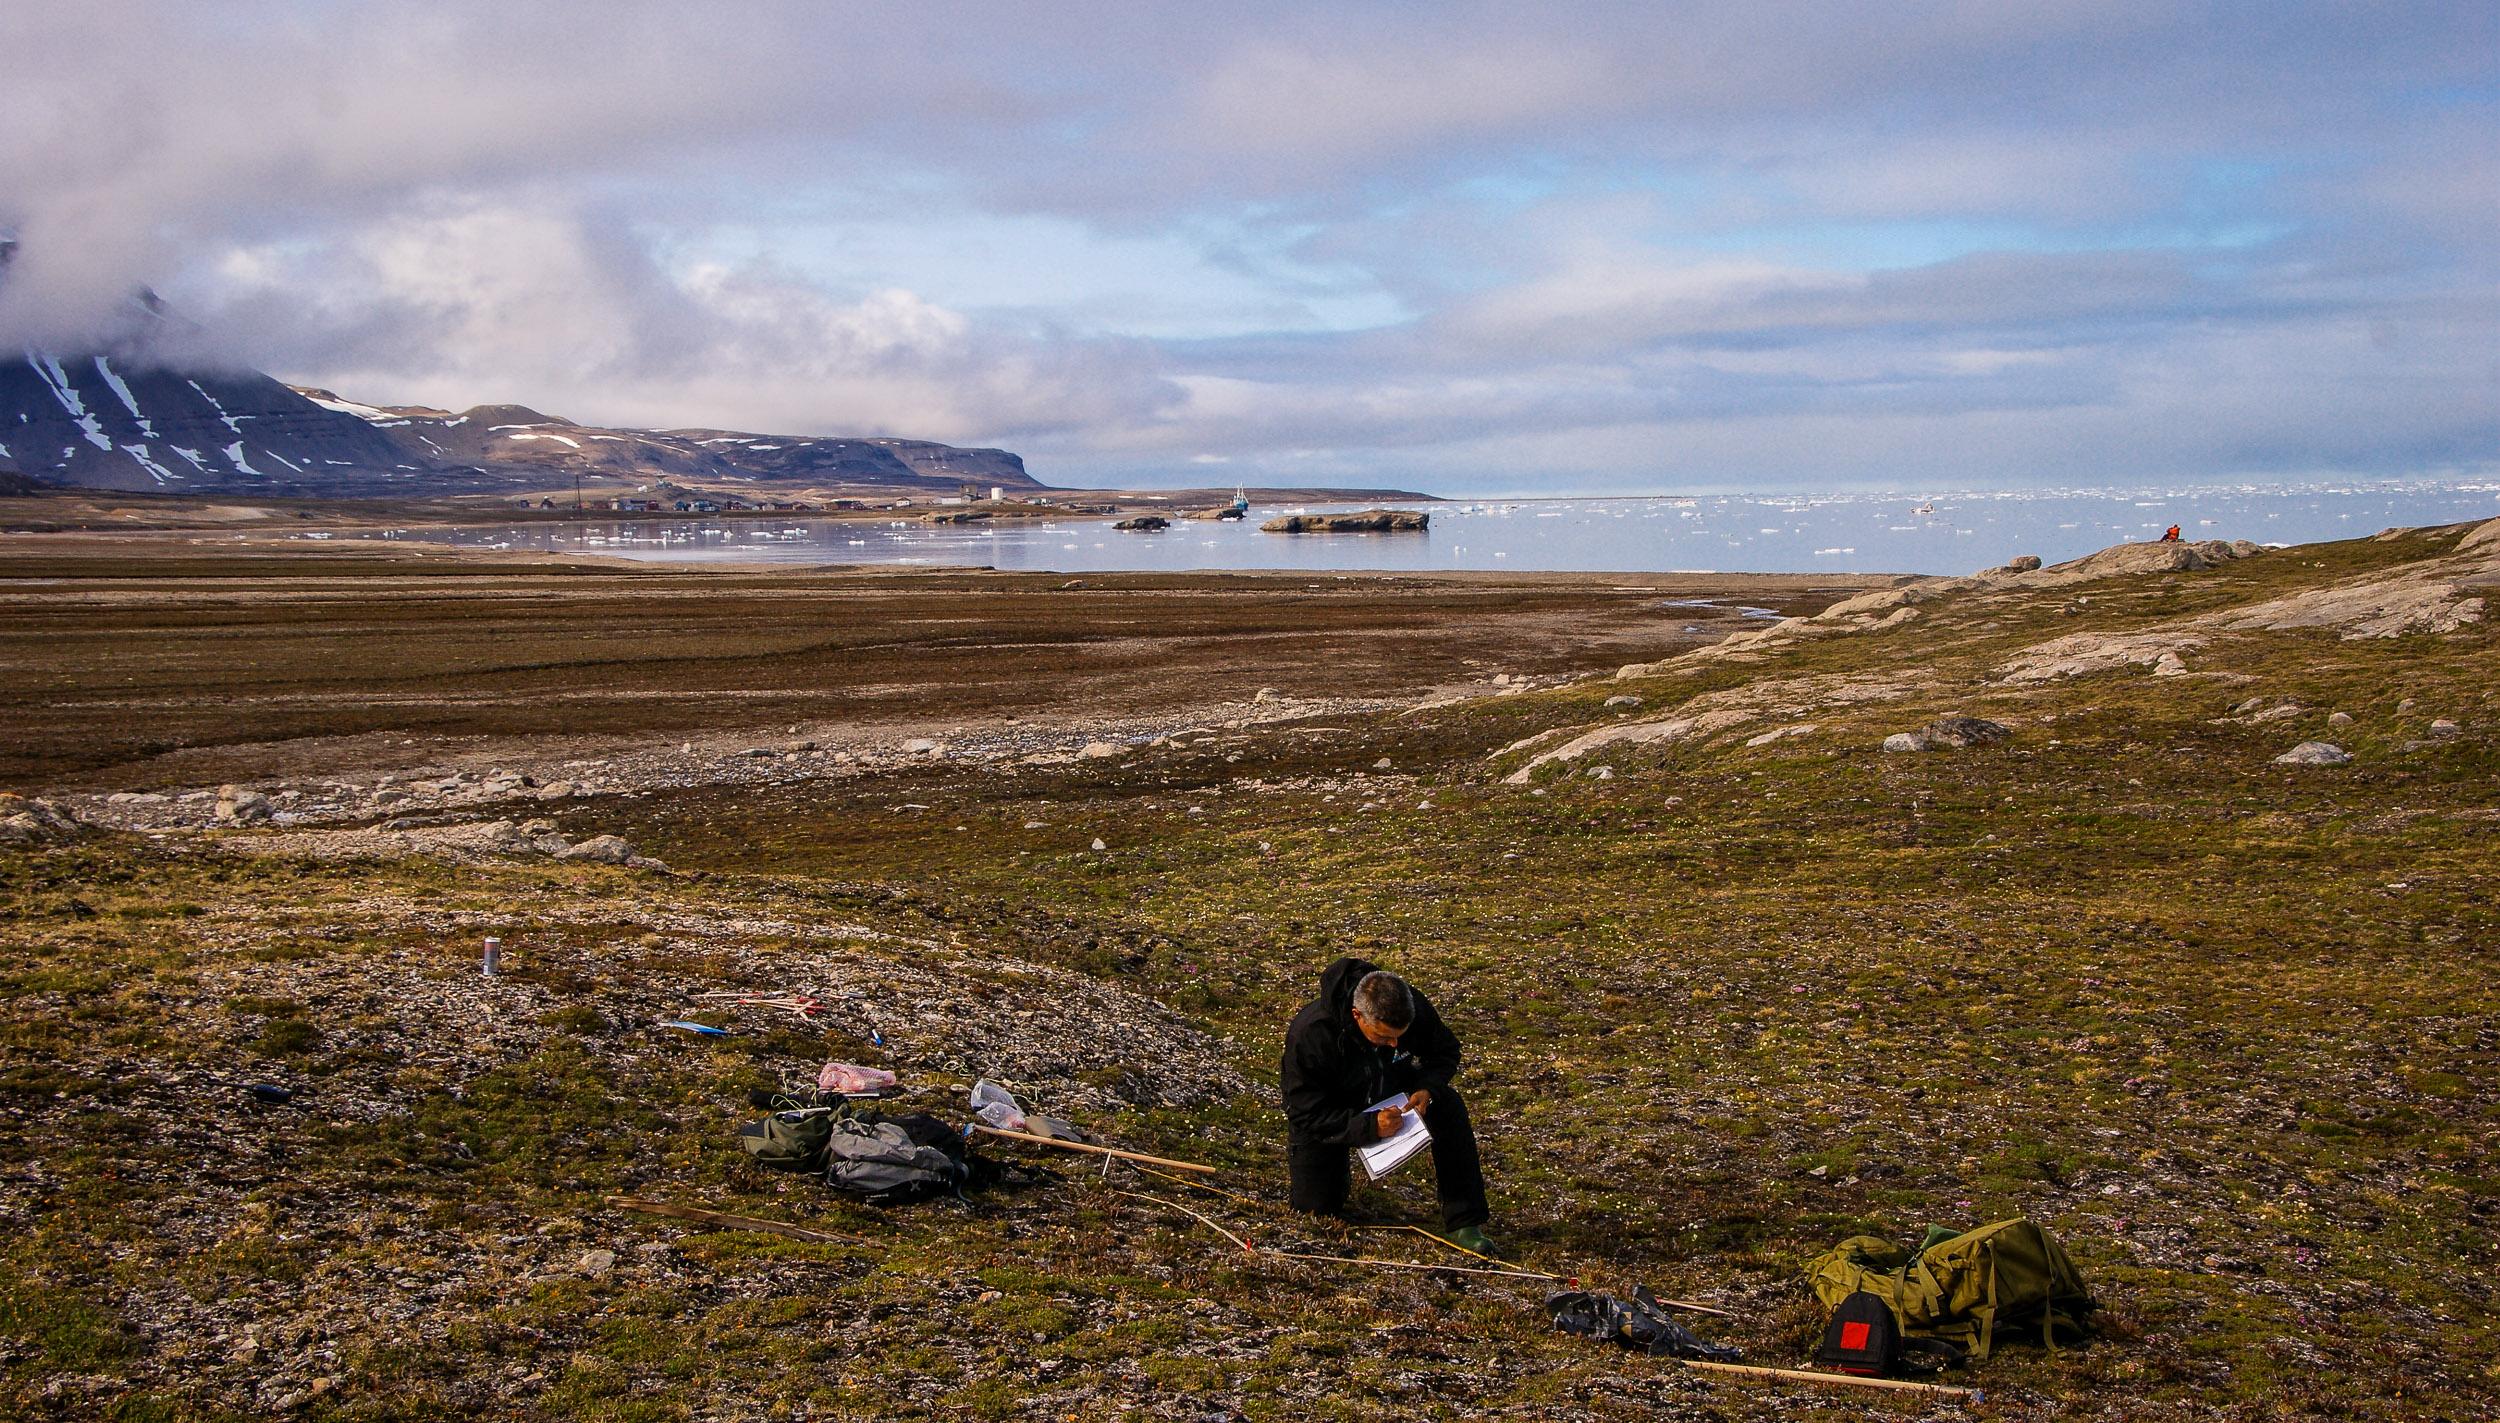 Senior researcher in ecology Jarle W. Bjerke is doing fieldwork on Svalbard. Kongsfjorden and Ny Ålesund in the background.  JONAA©Trond Johnsen